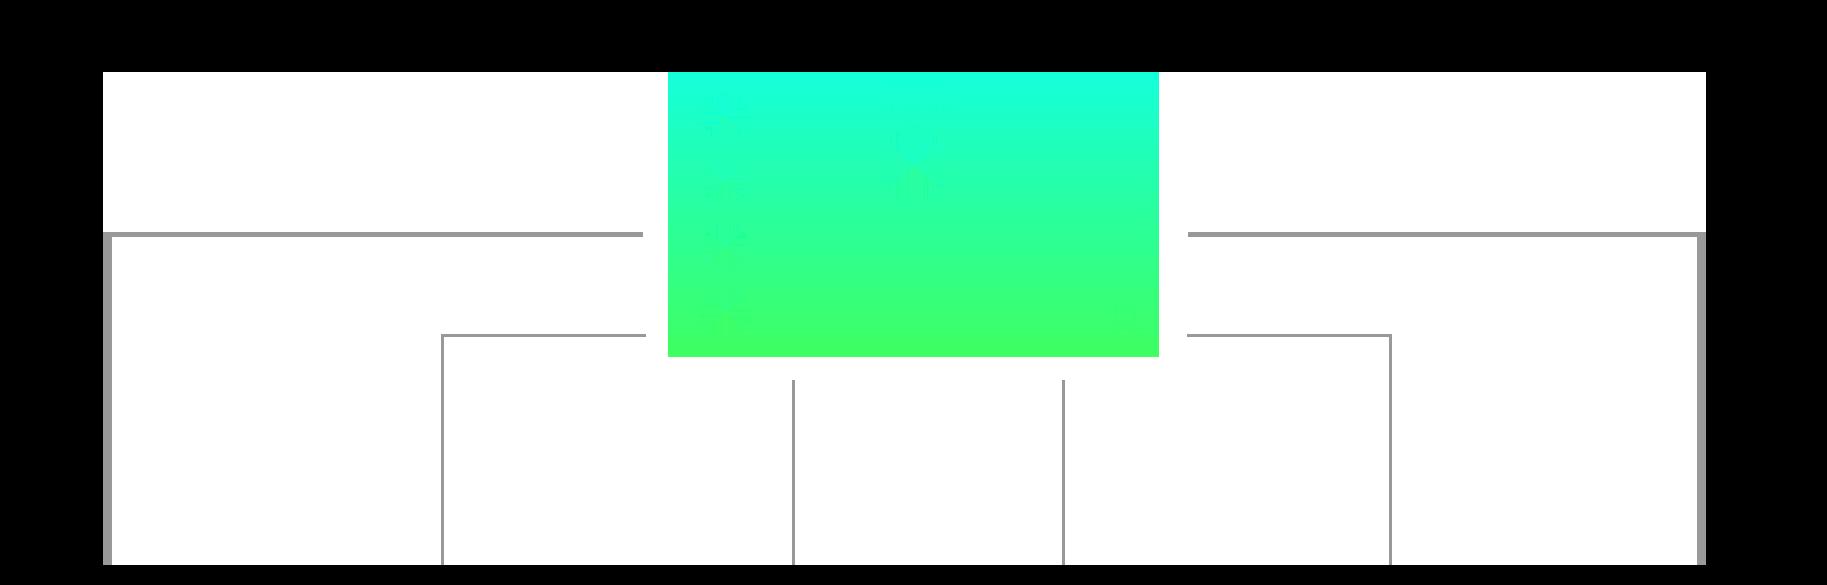 product gradient-halfed size